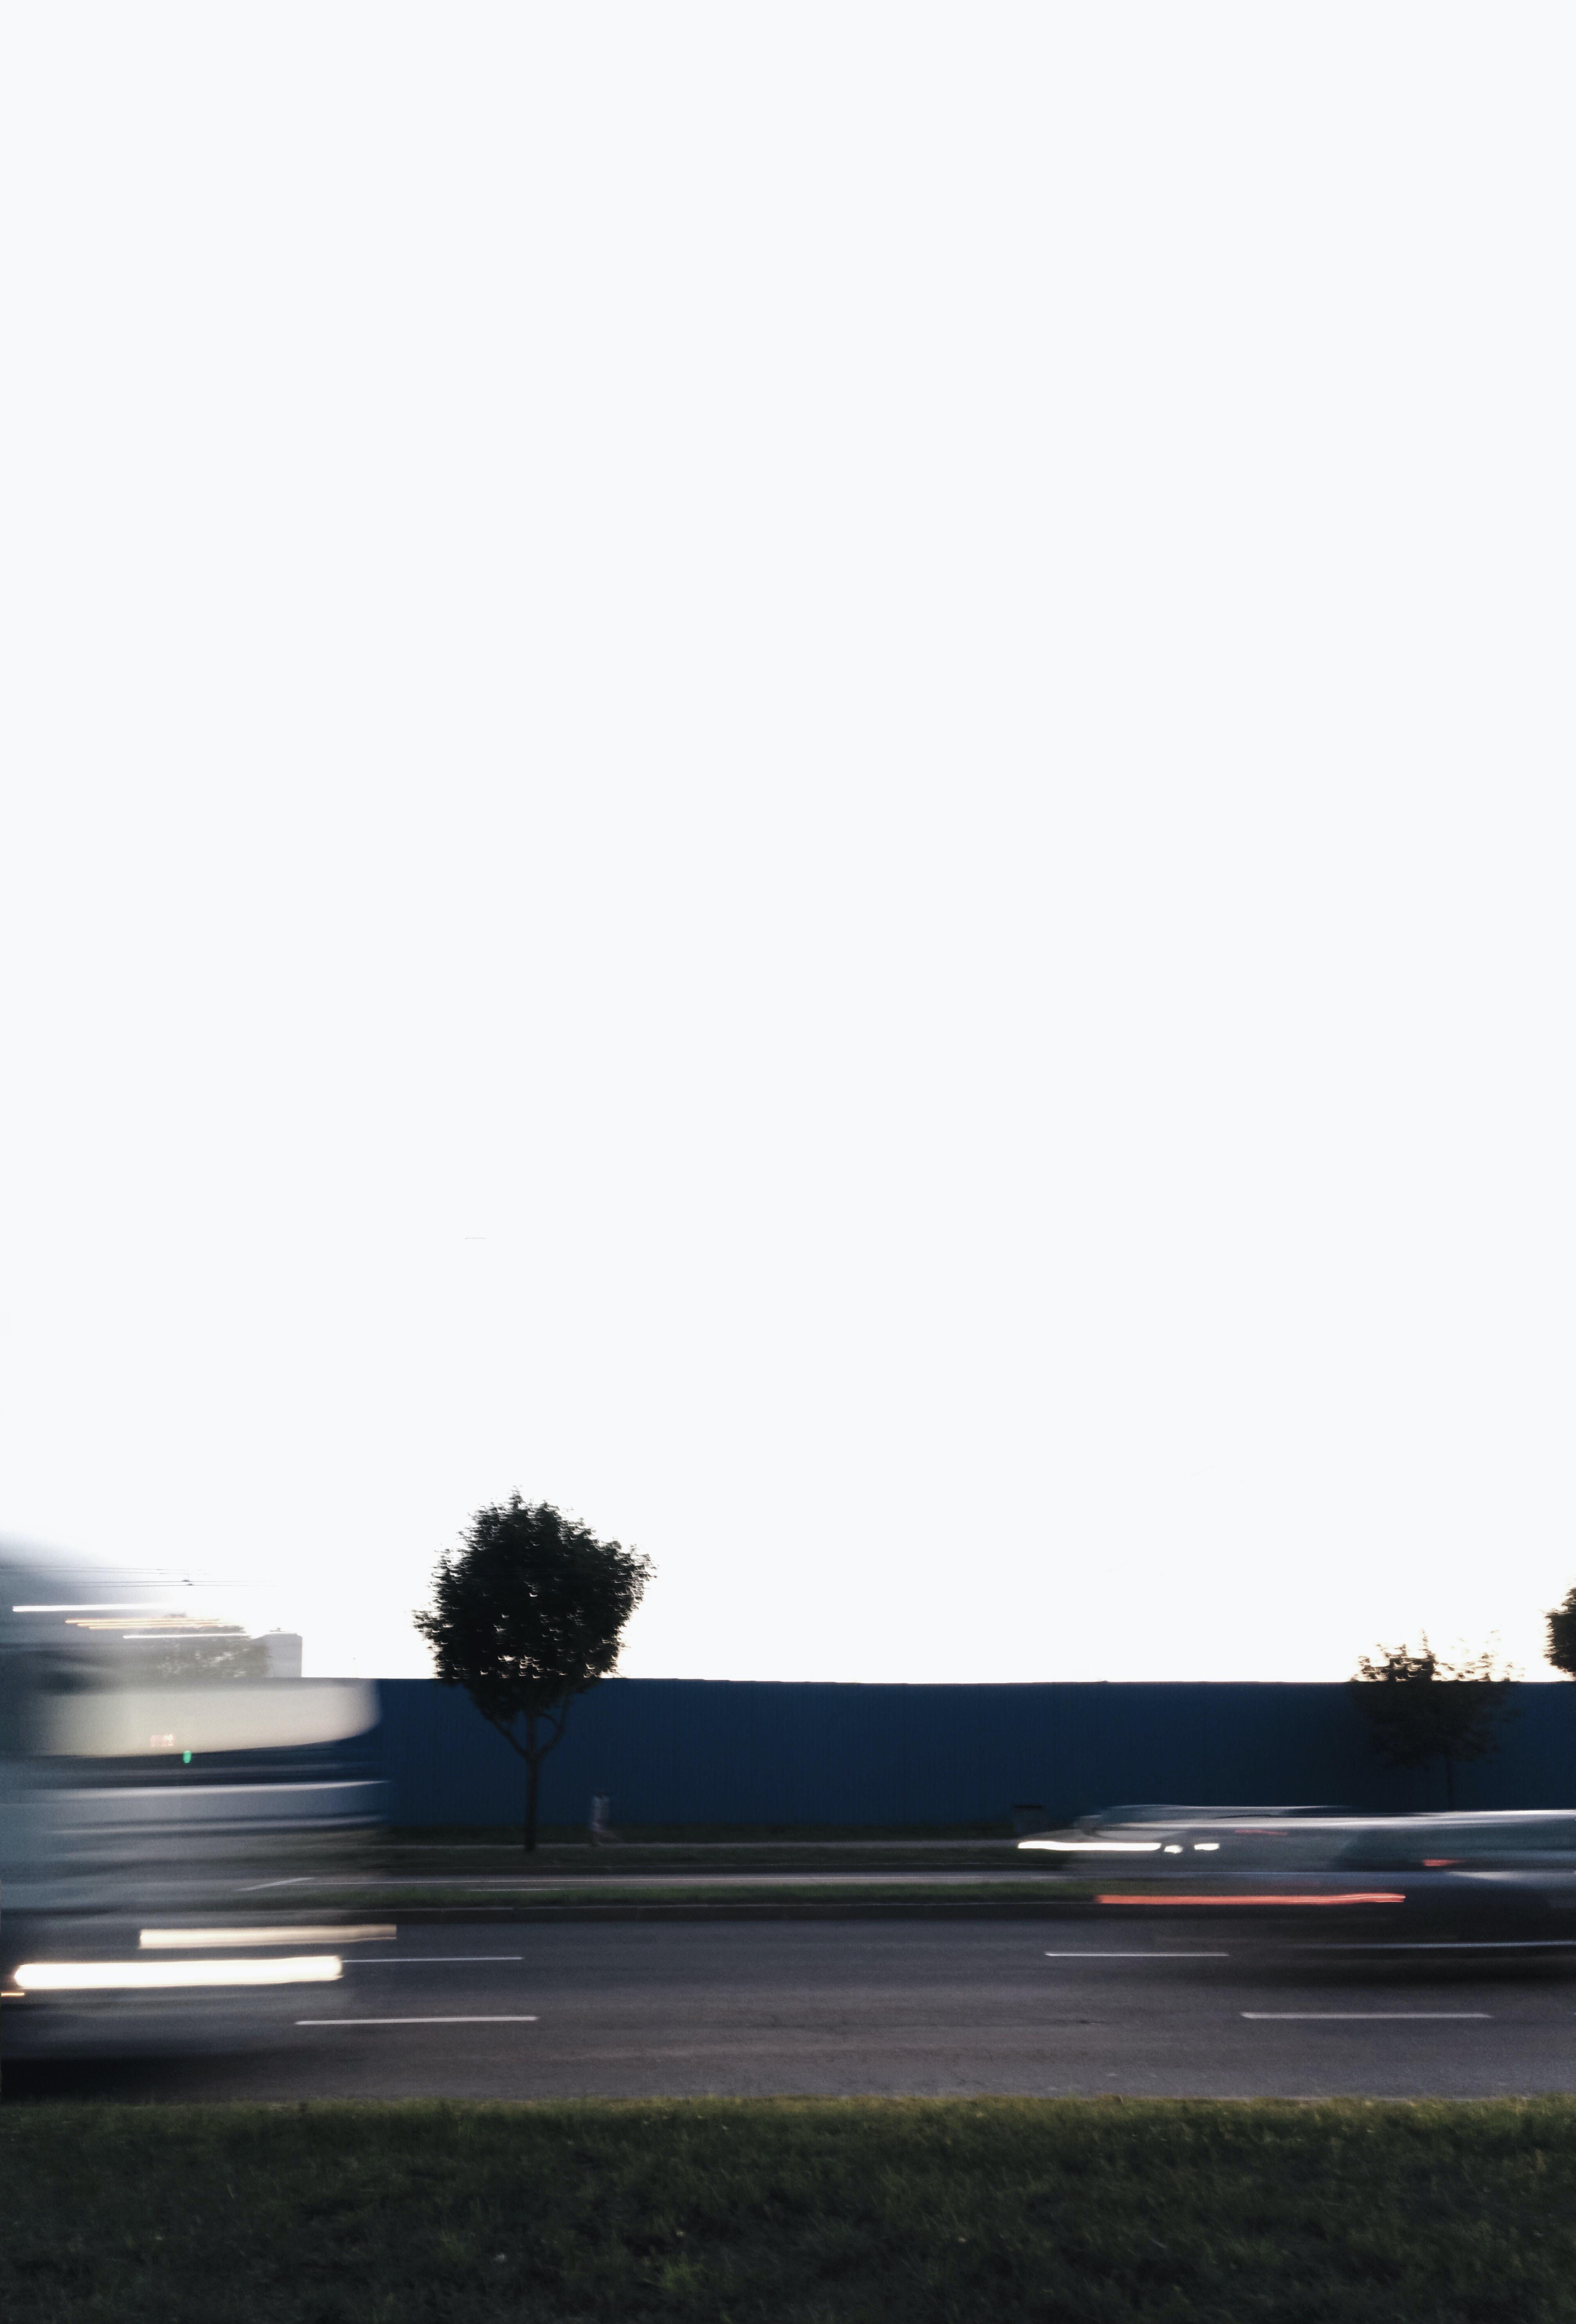 time-lapse photo of vehicle